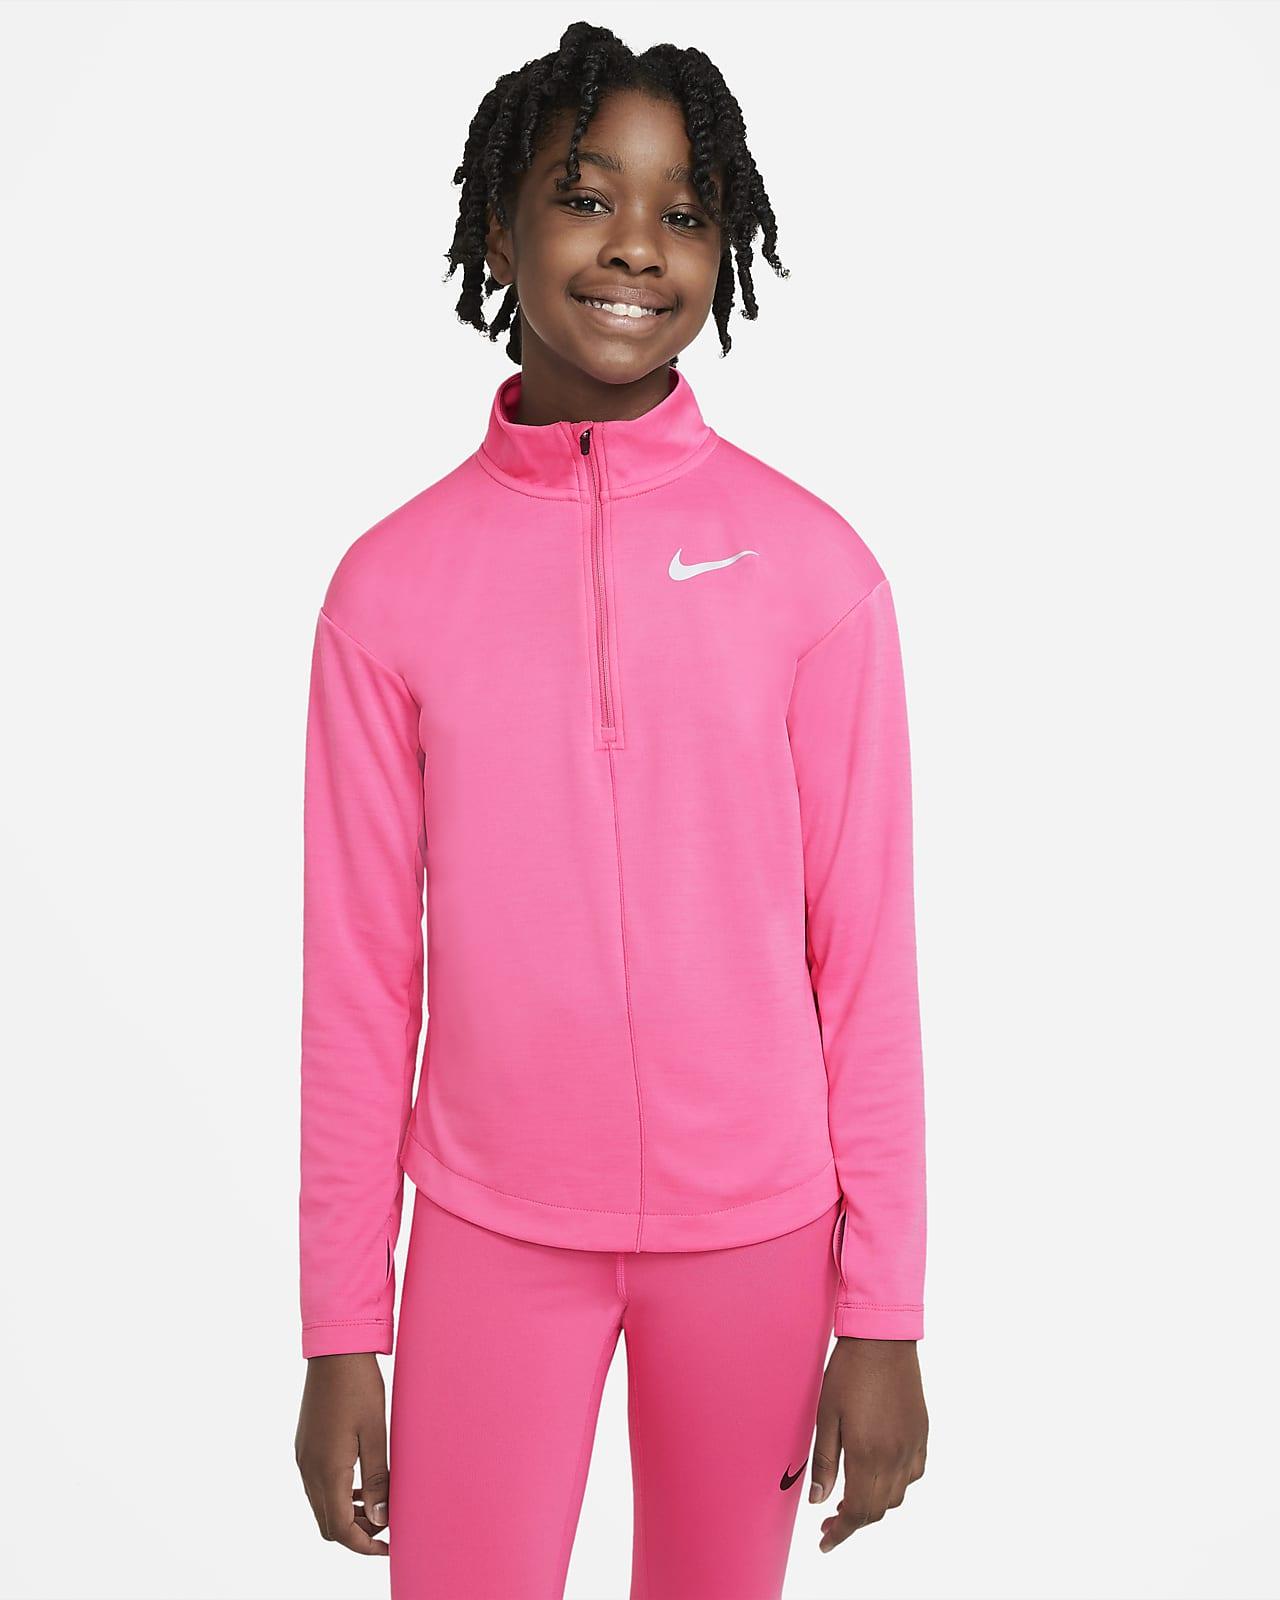 Nike Older Kids' (Girls') 1/2-Zip Long-Sleeve Running Top